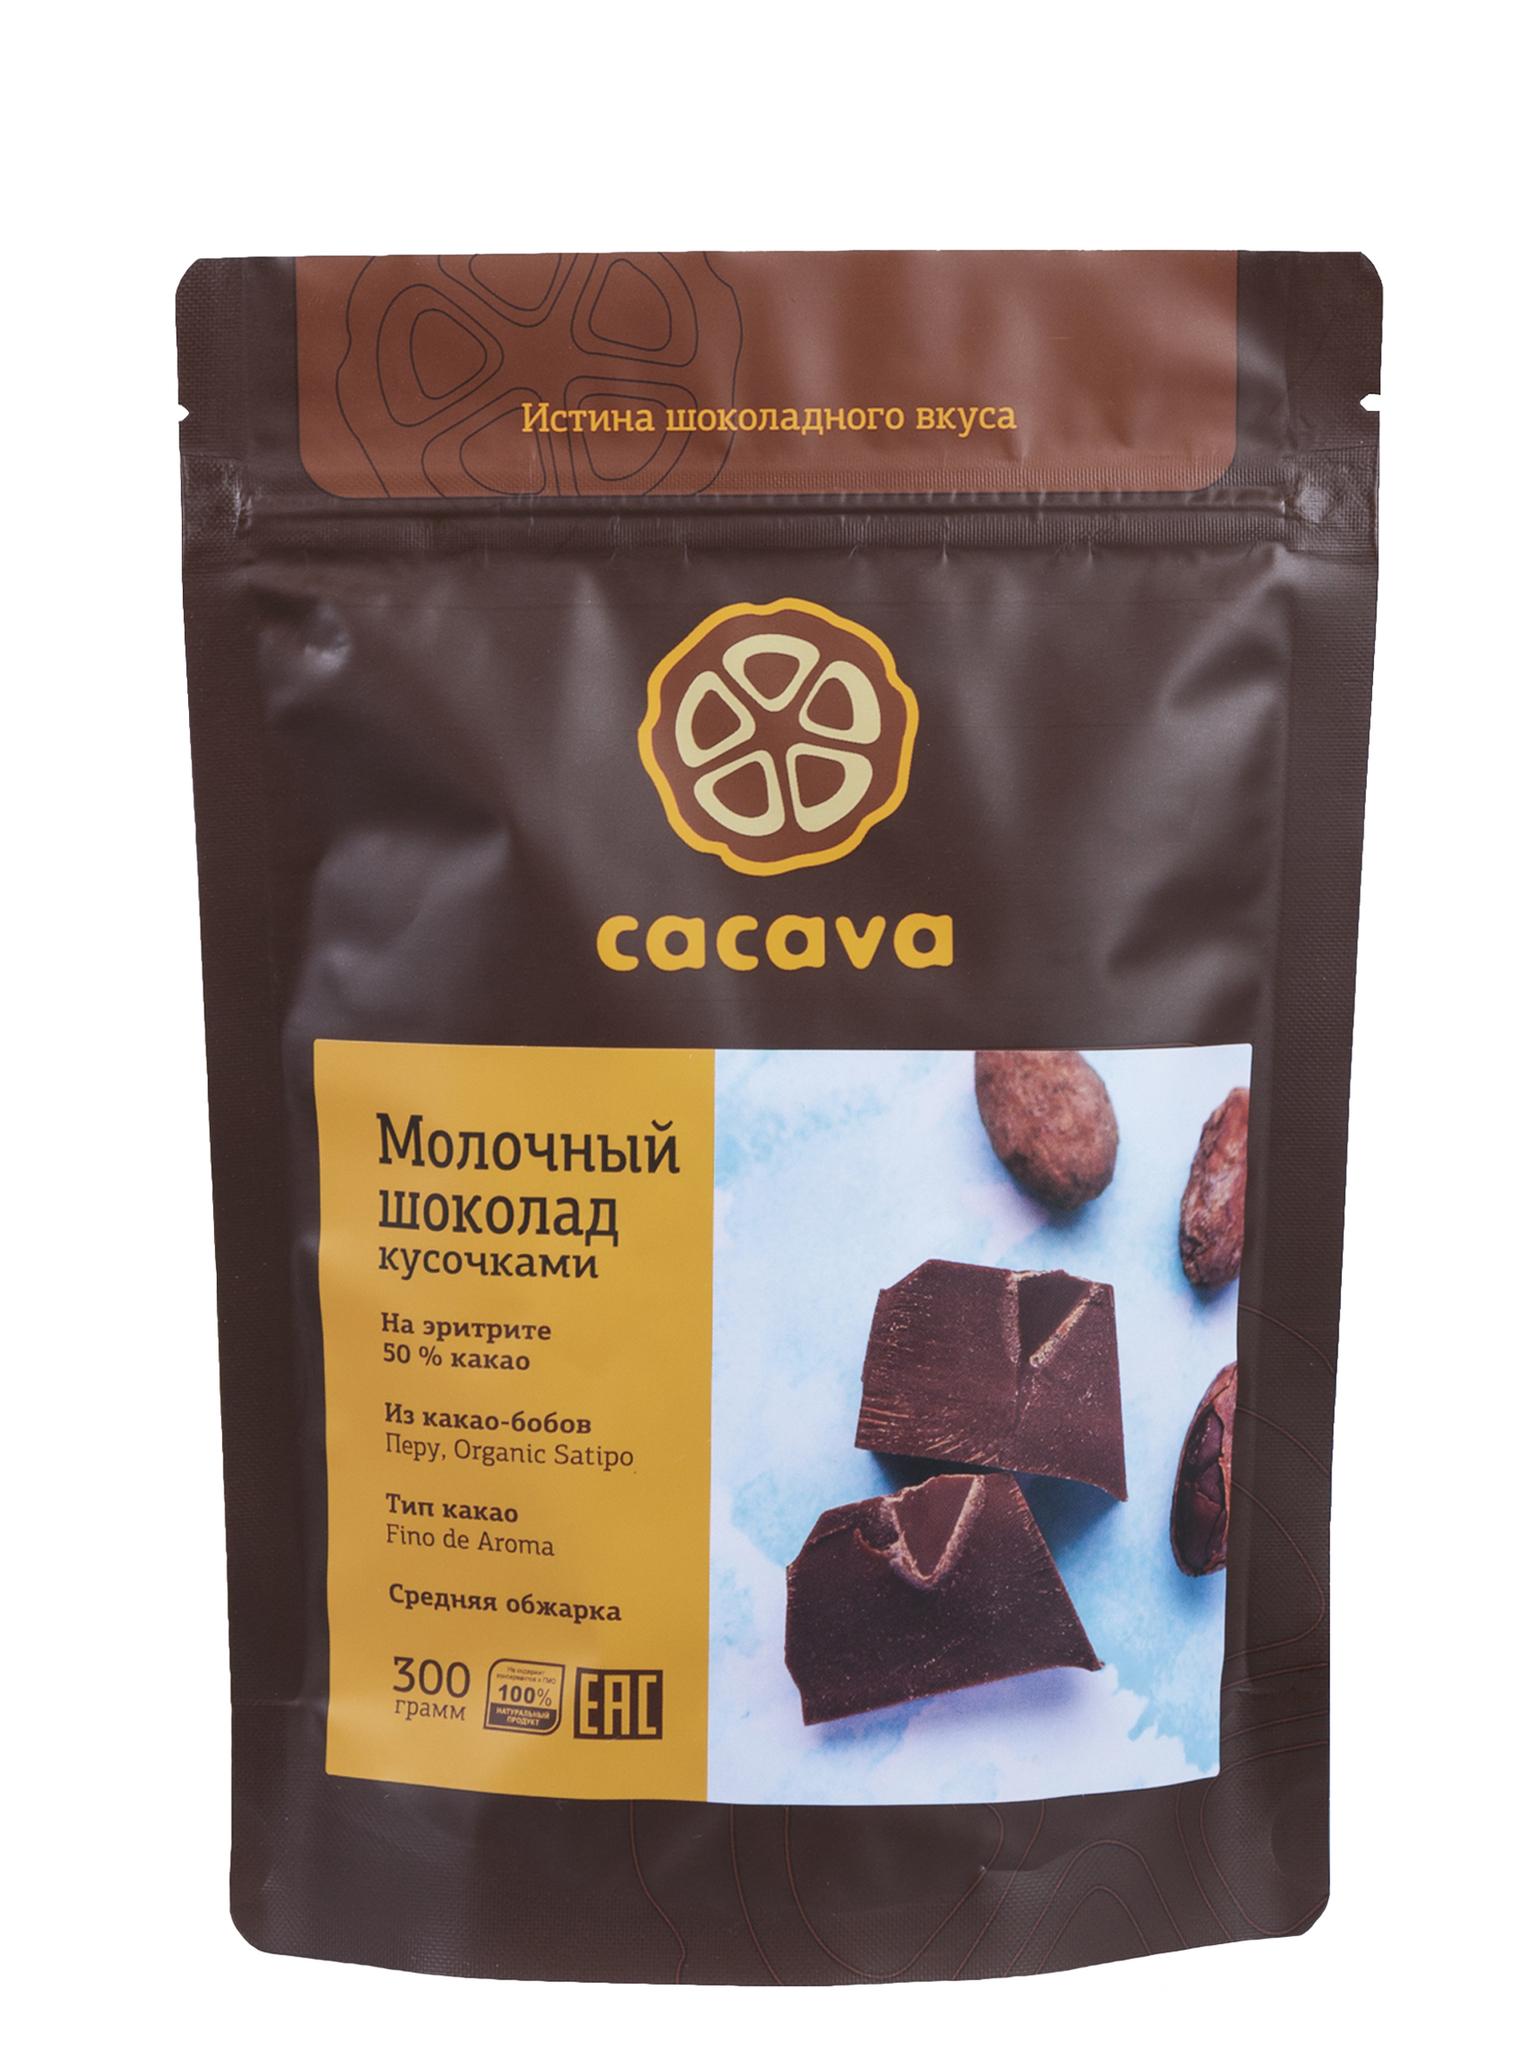 Молочный шоколад 50 % какао, на эритрите, упаковка 300 грамм